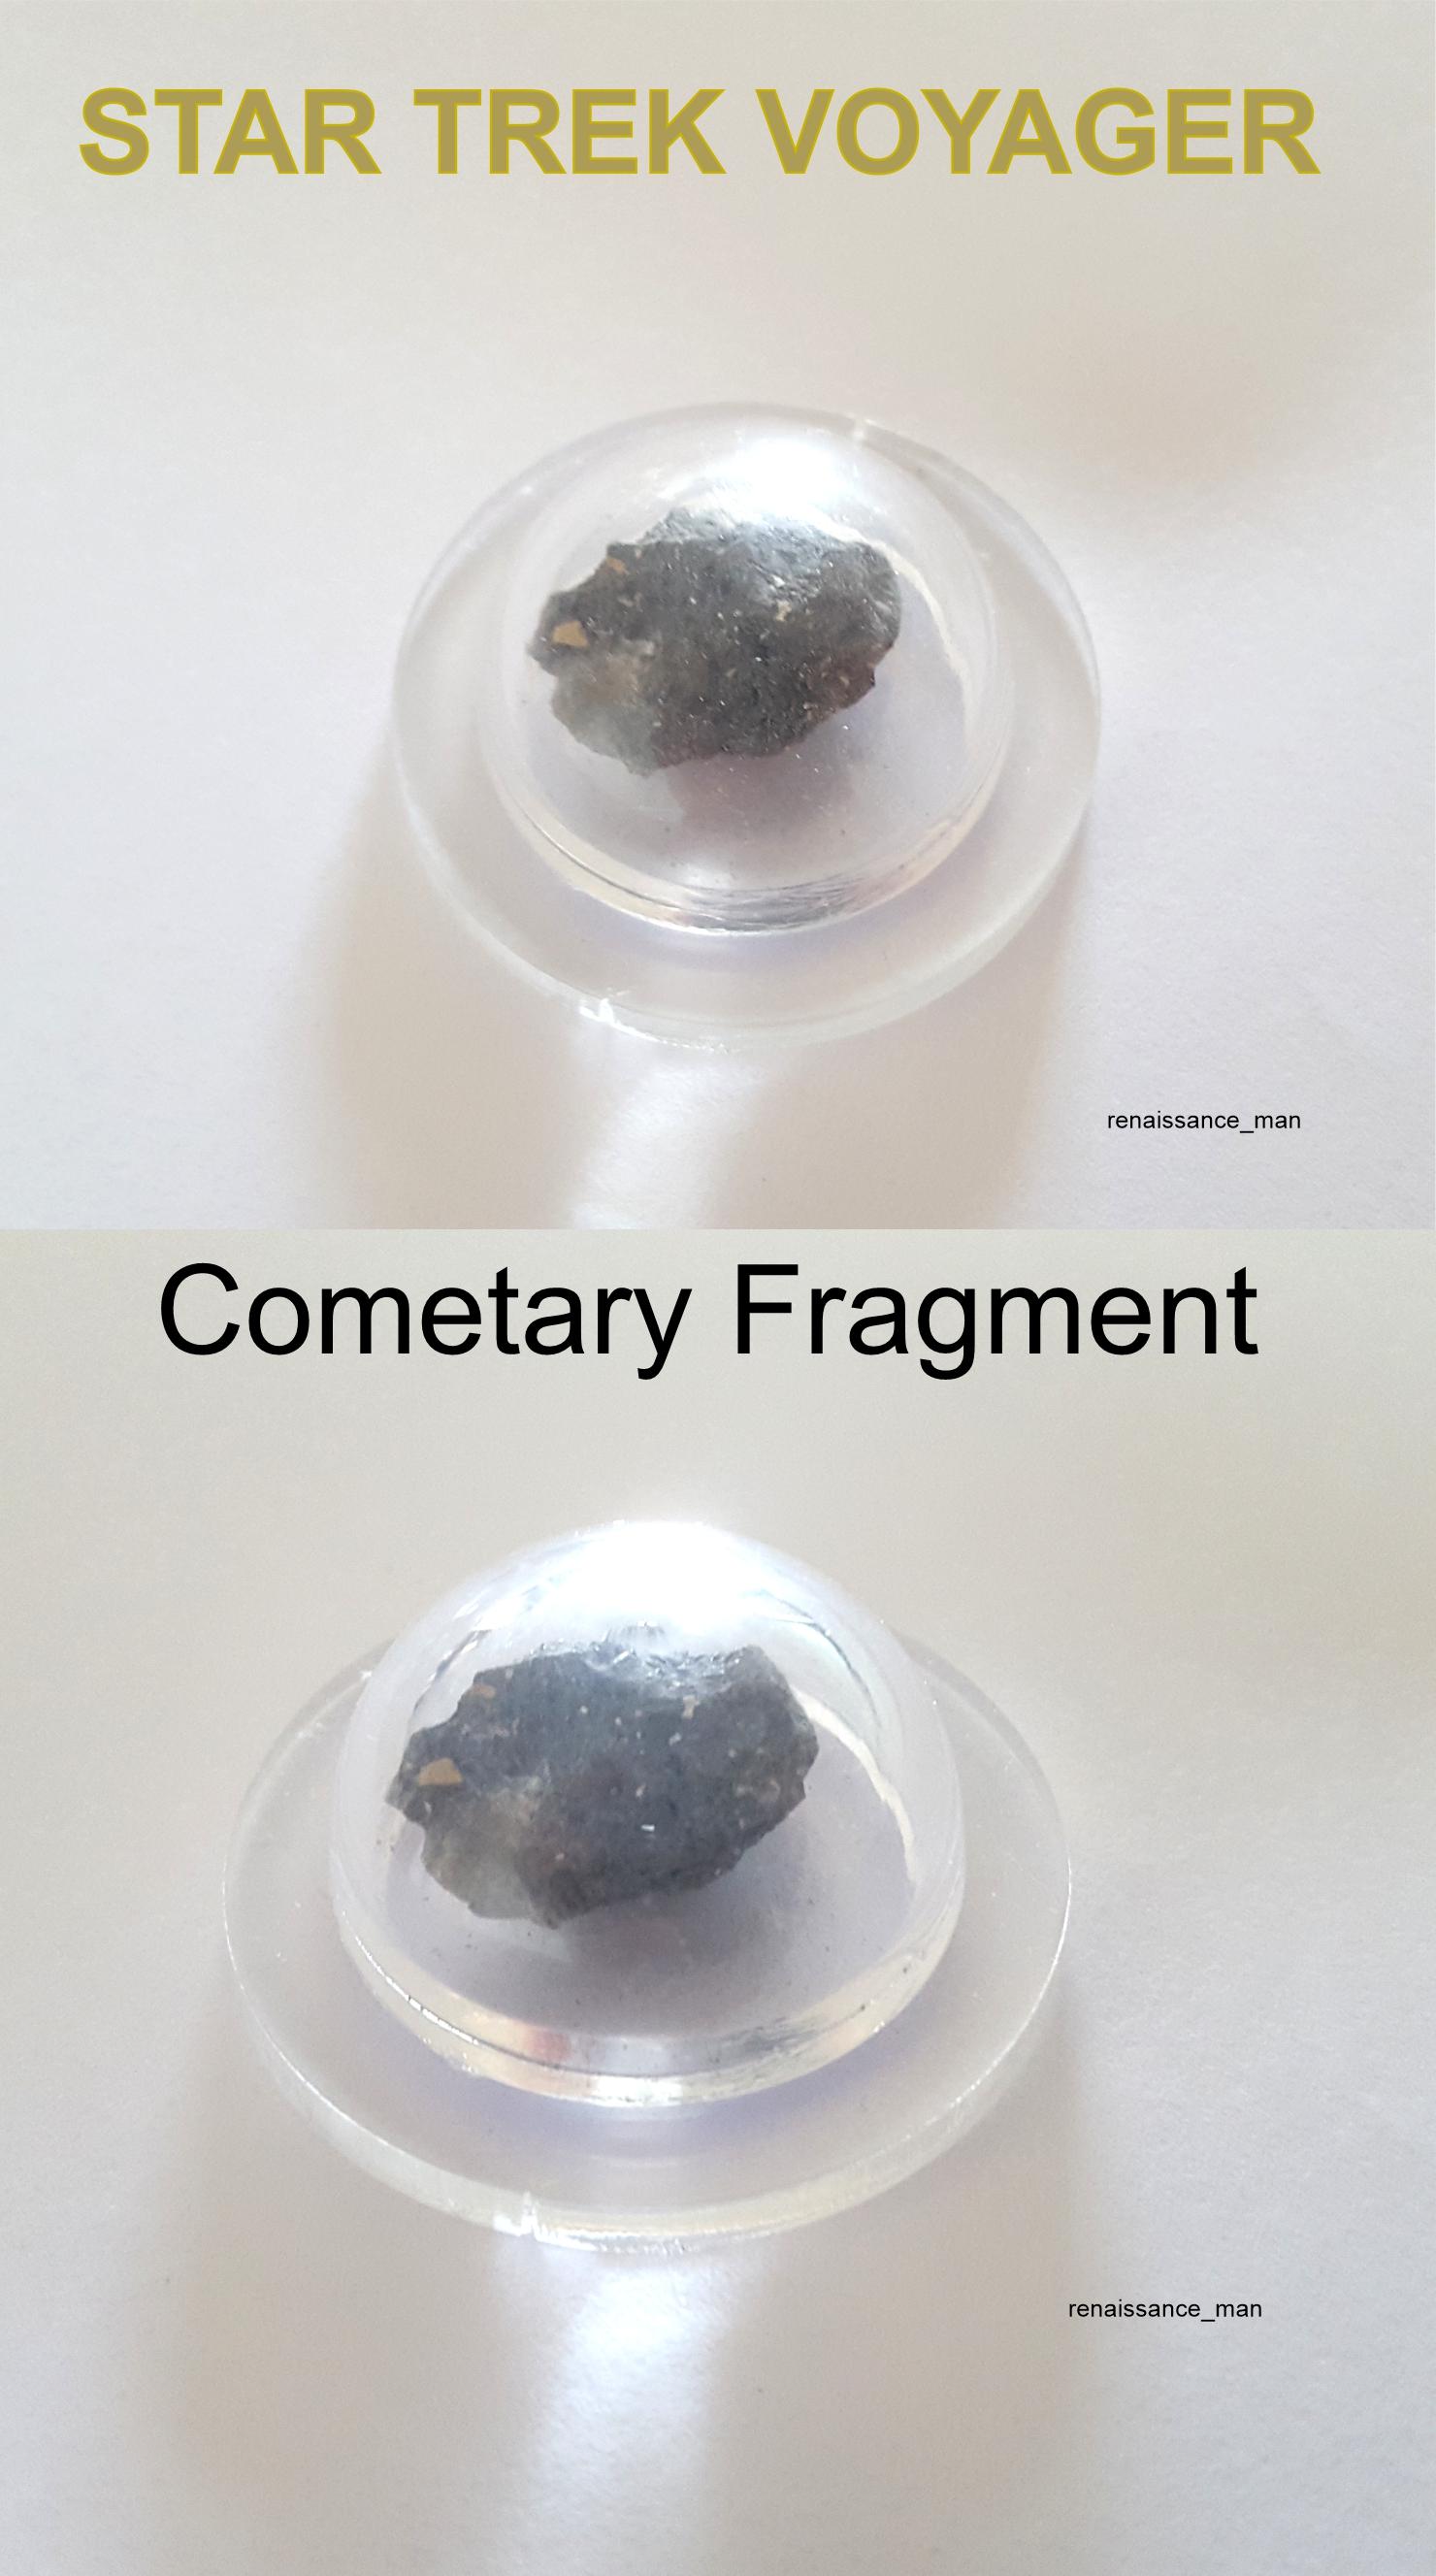 Voyager-Cometary-Fragement.jpg